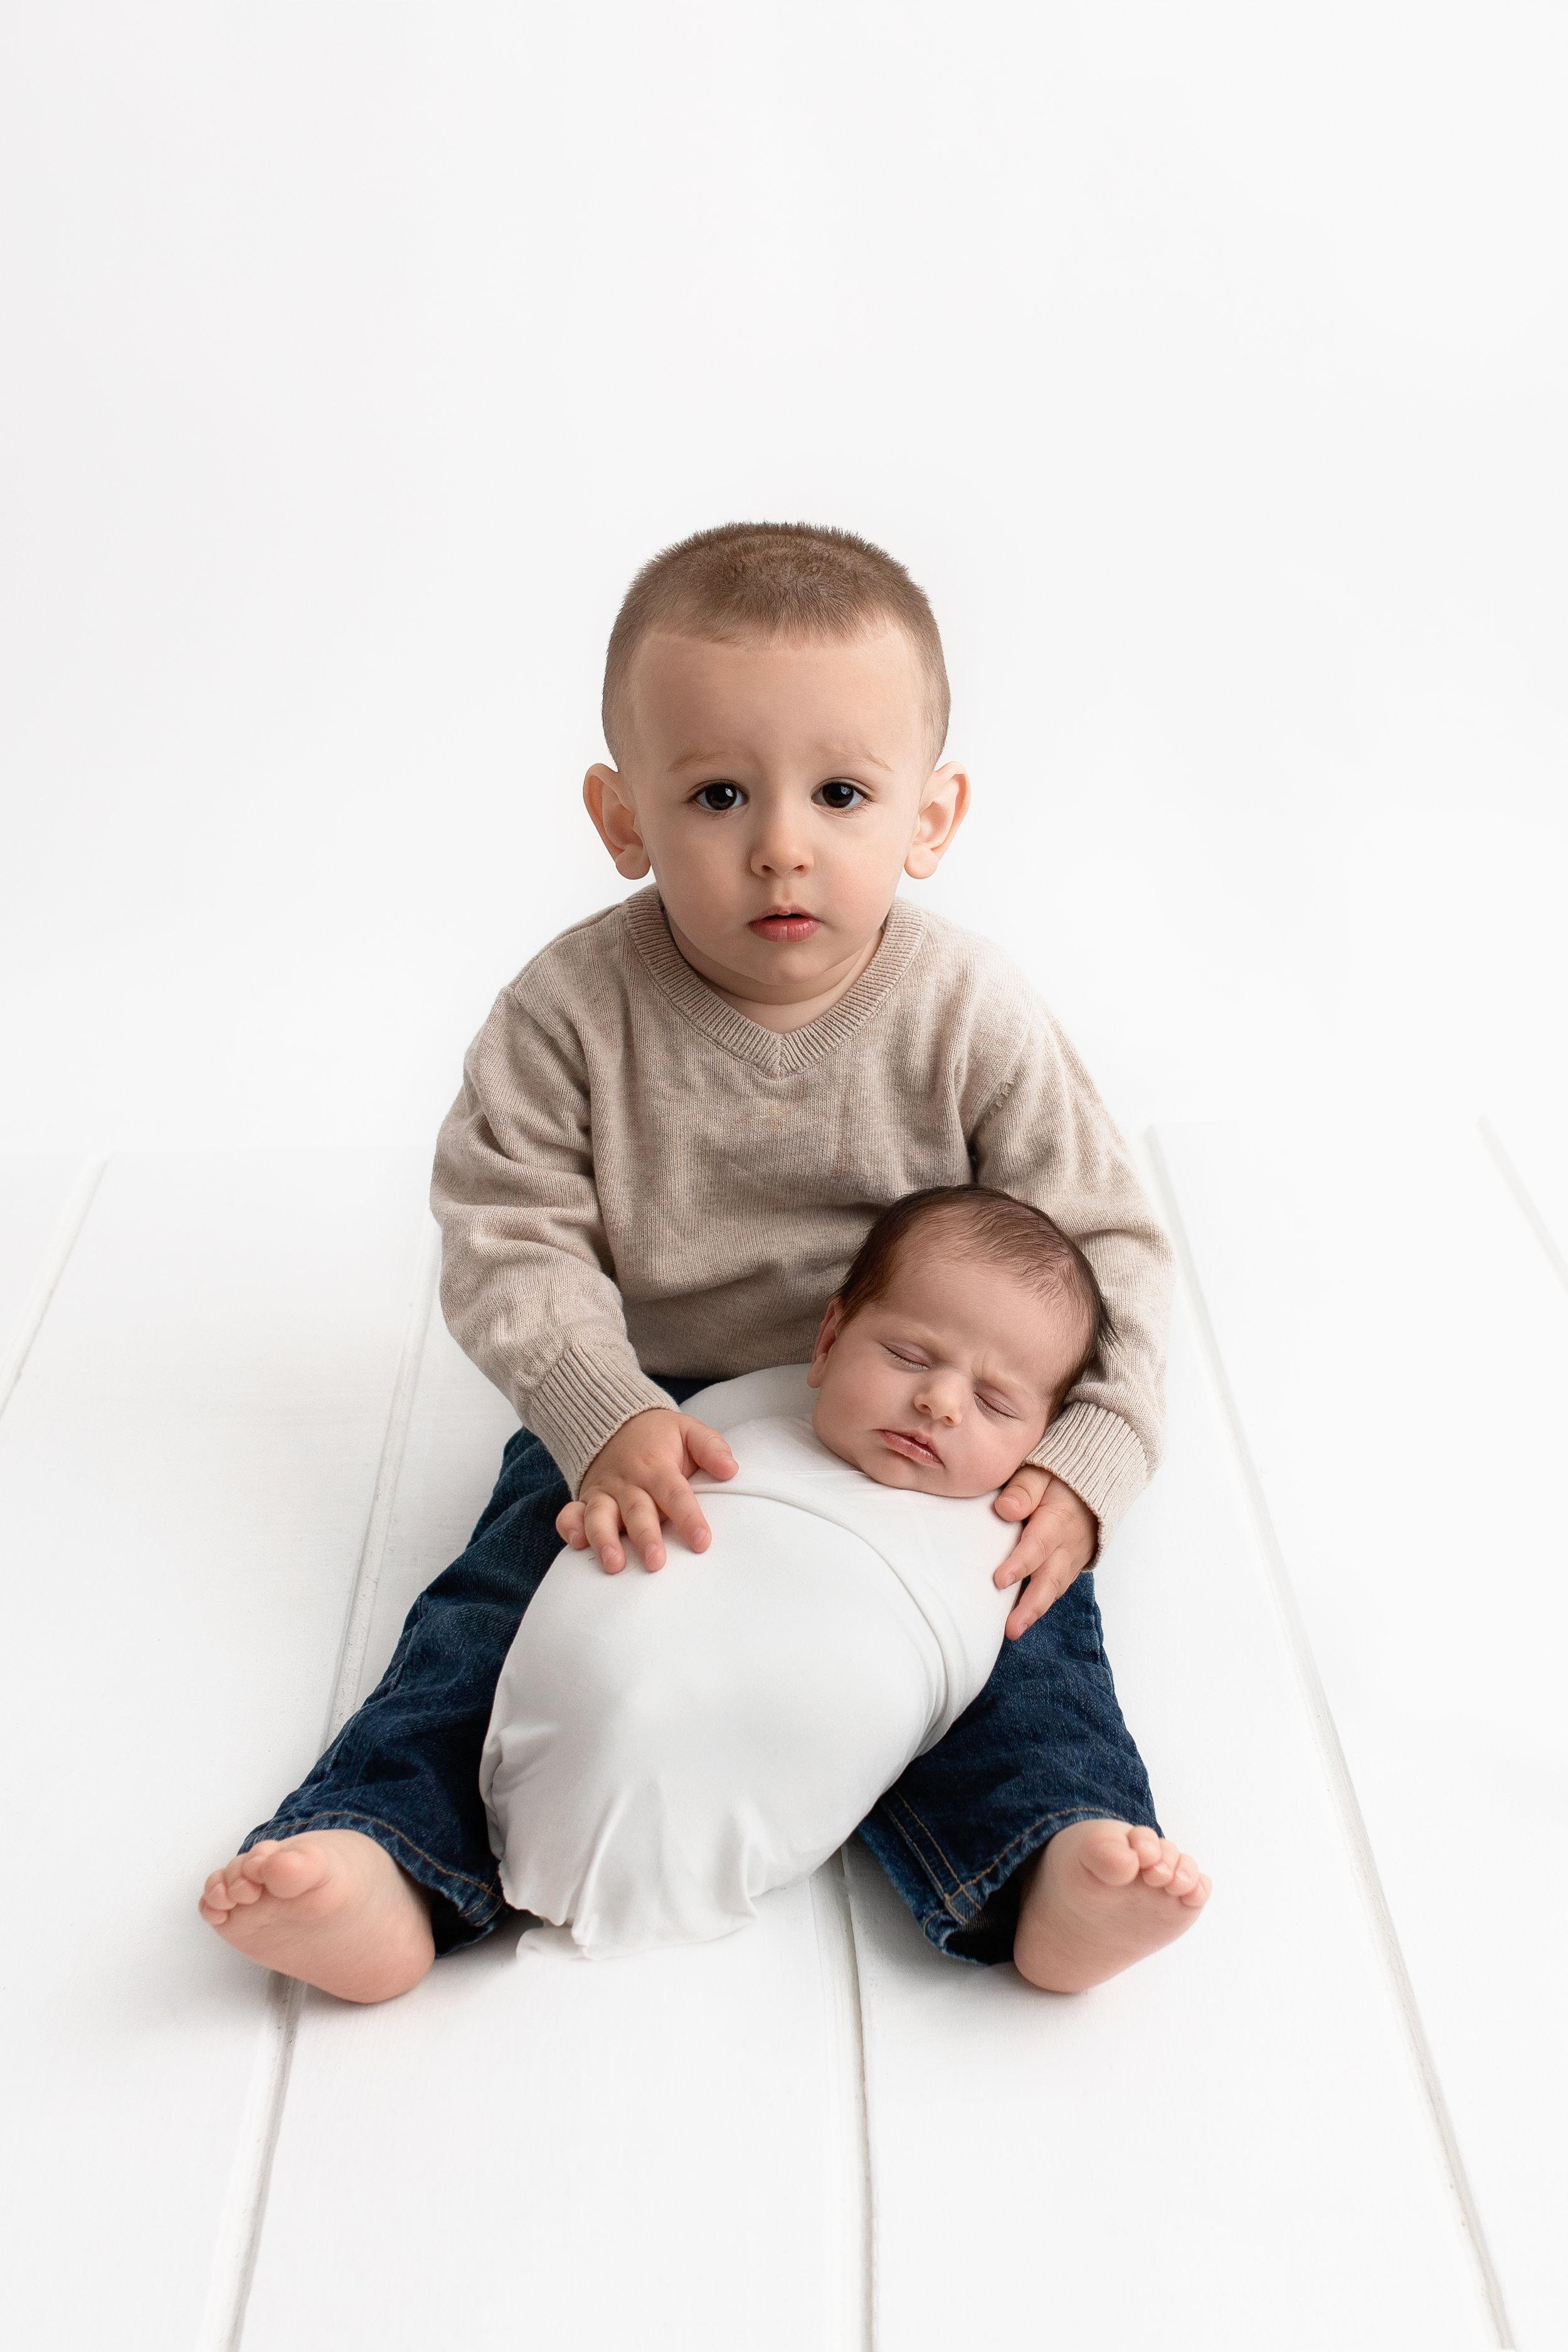 best baby photographer edmonton newborn photoshoot st-albert baby photos blooming bliss photography